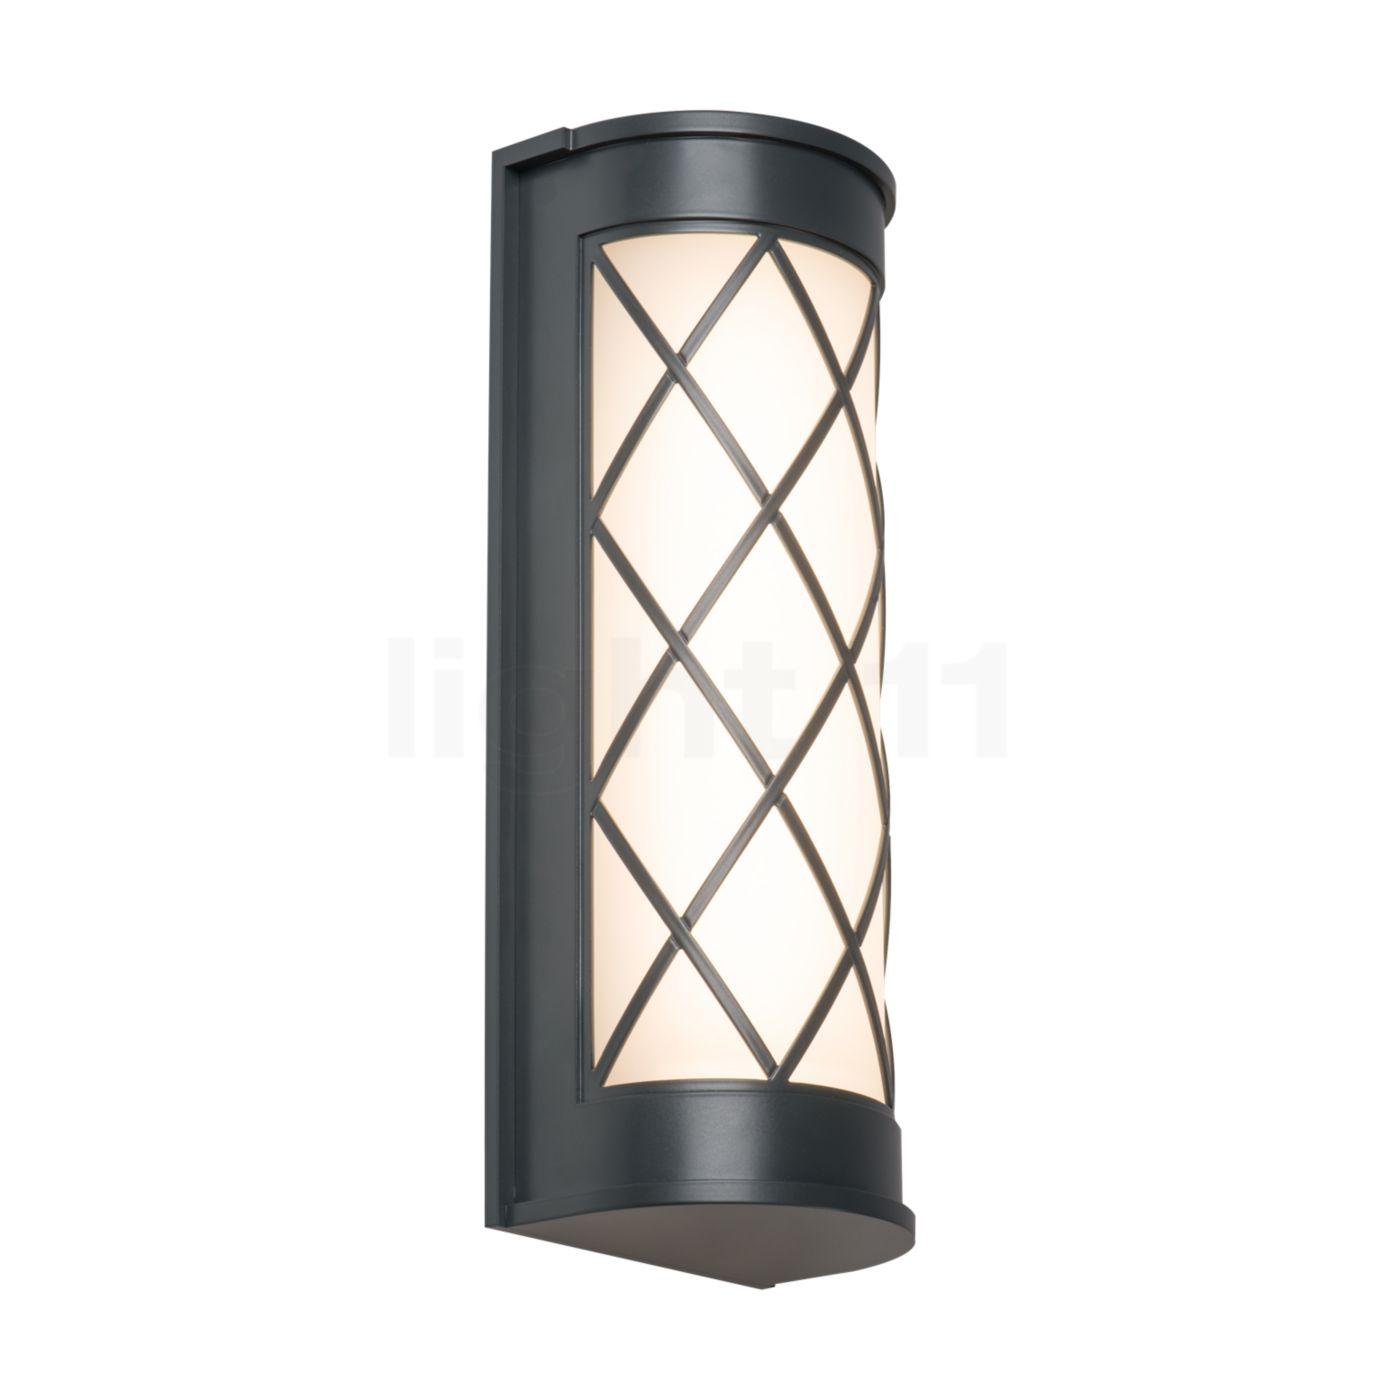 Mawa Grunewald Wandleuchte LED, bronze metallic gu1-2700-br